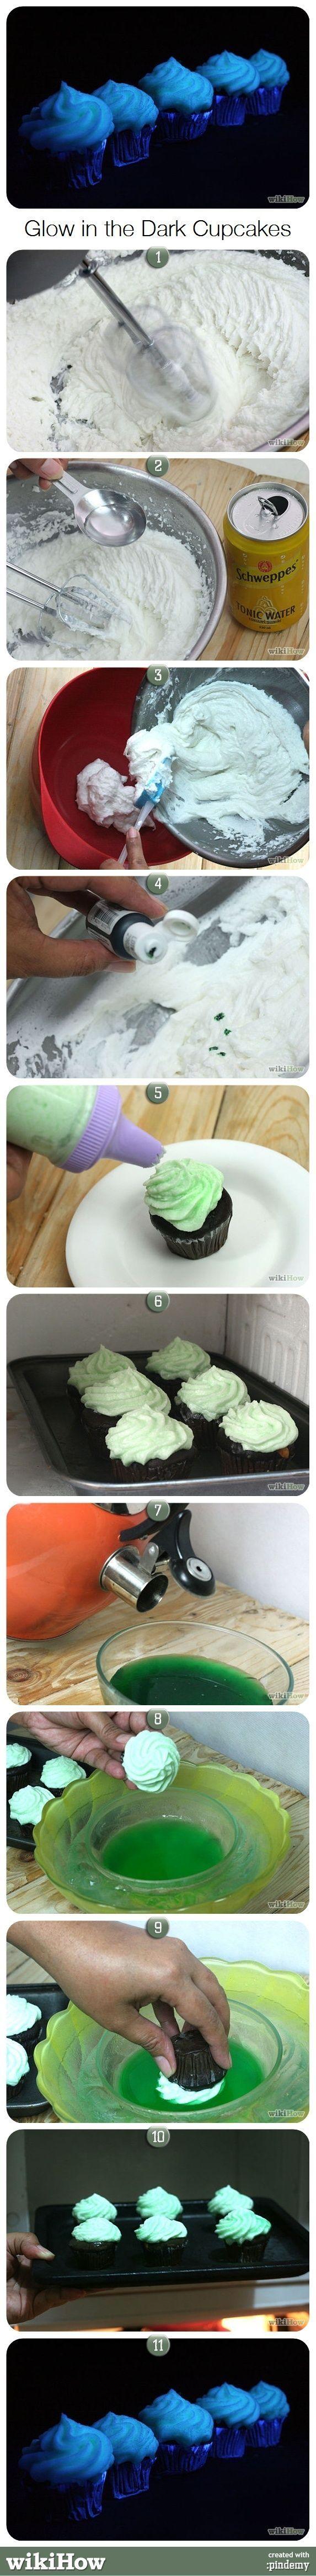 How to Make Glow in the Dark Cupcakes |  #Cupcakes #Dark #Glow #Make